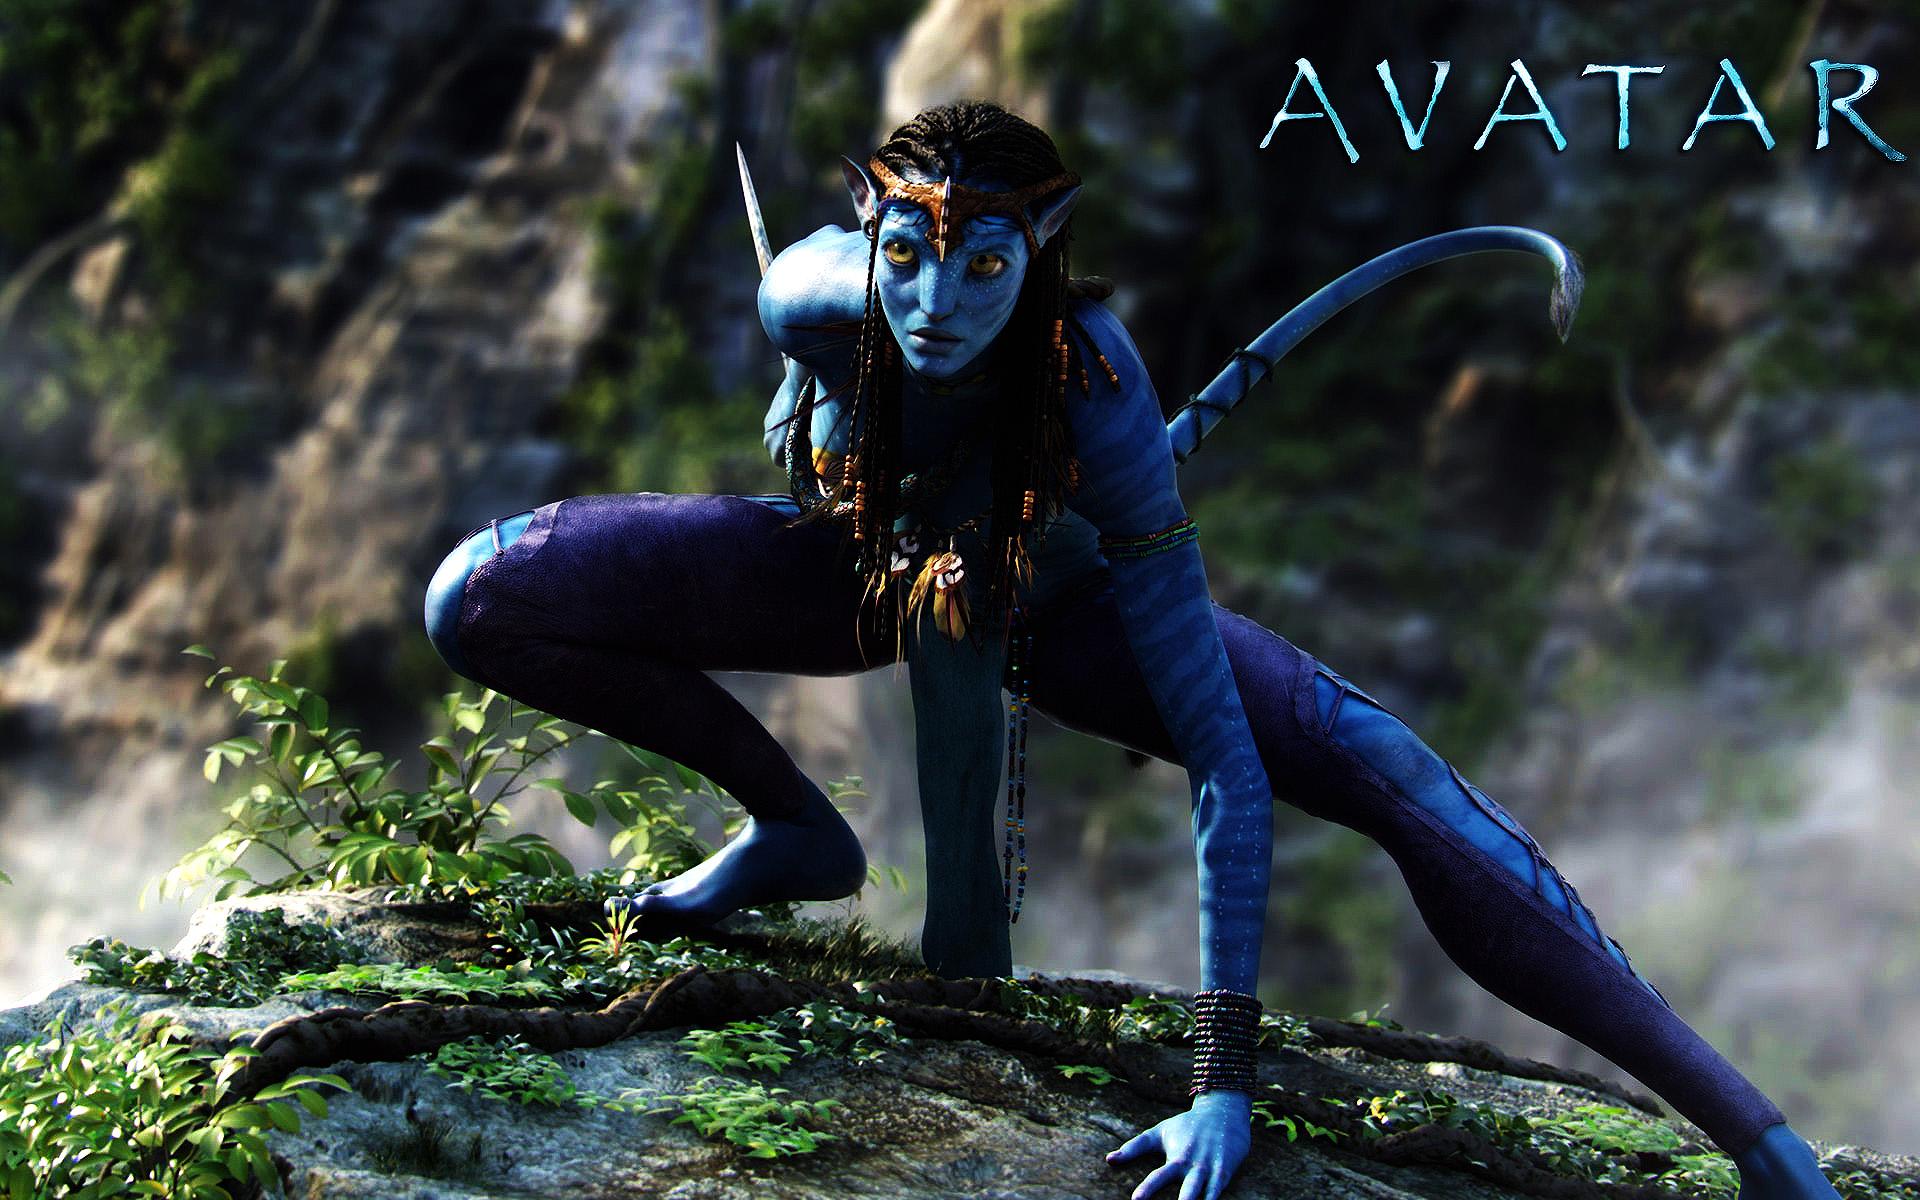 avatar-wallpaper-movie-alwinclores-20917